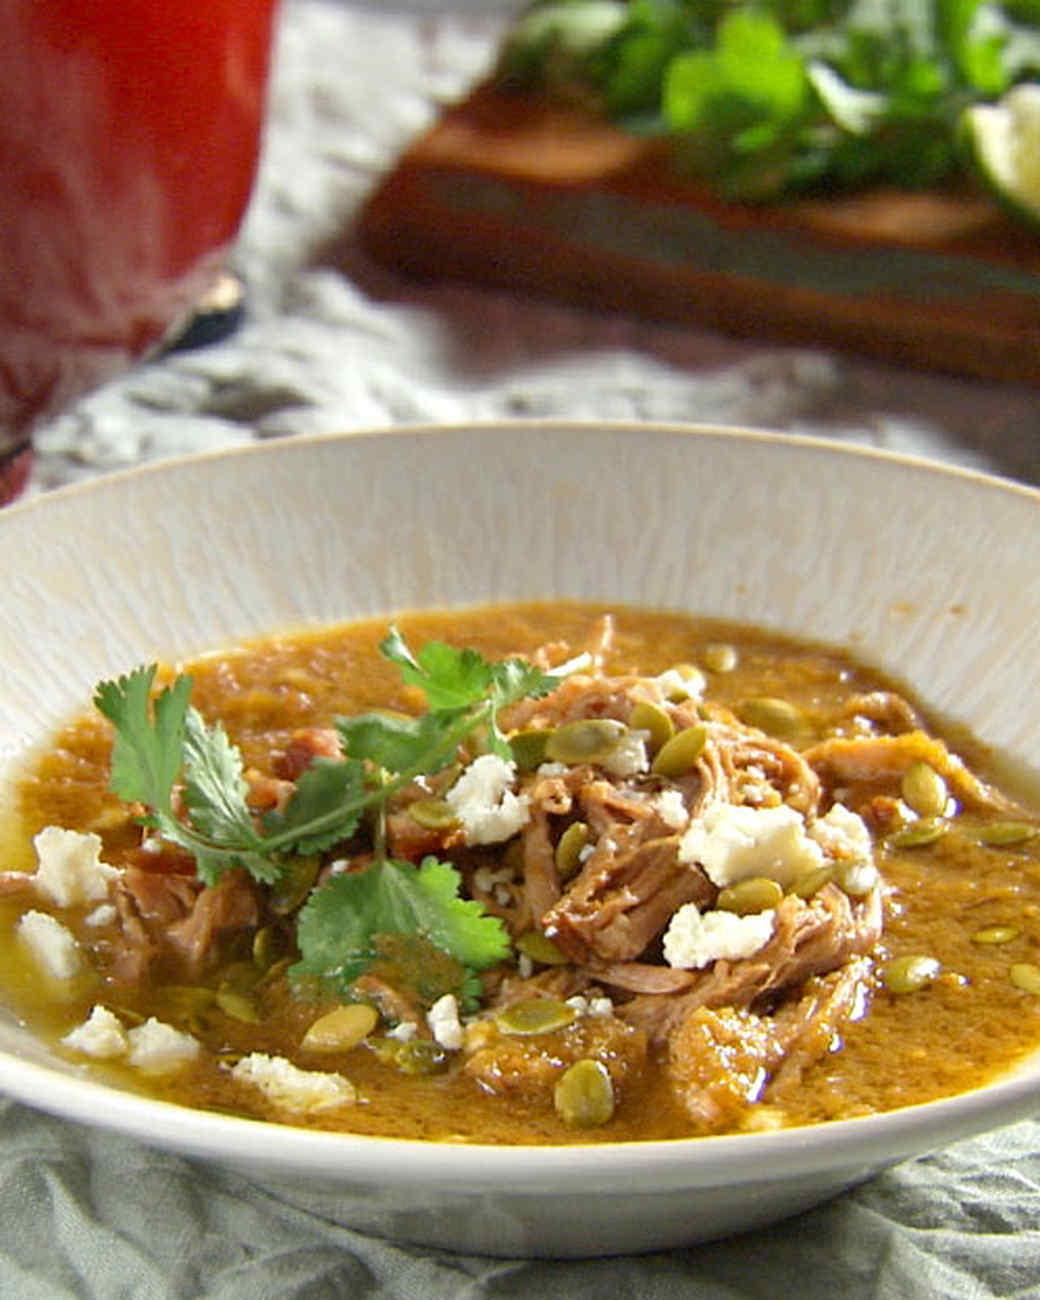 Tomatillo pork stew recipes